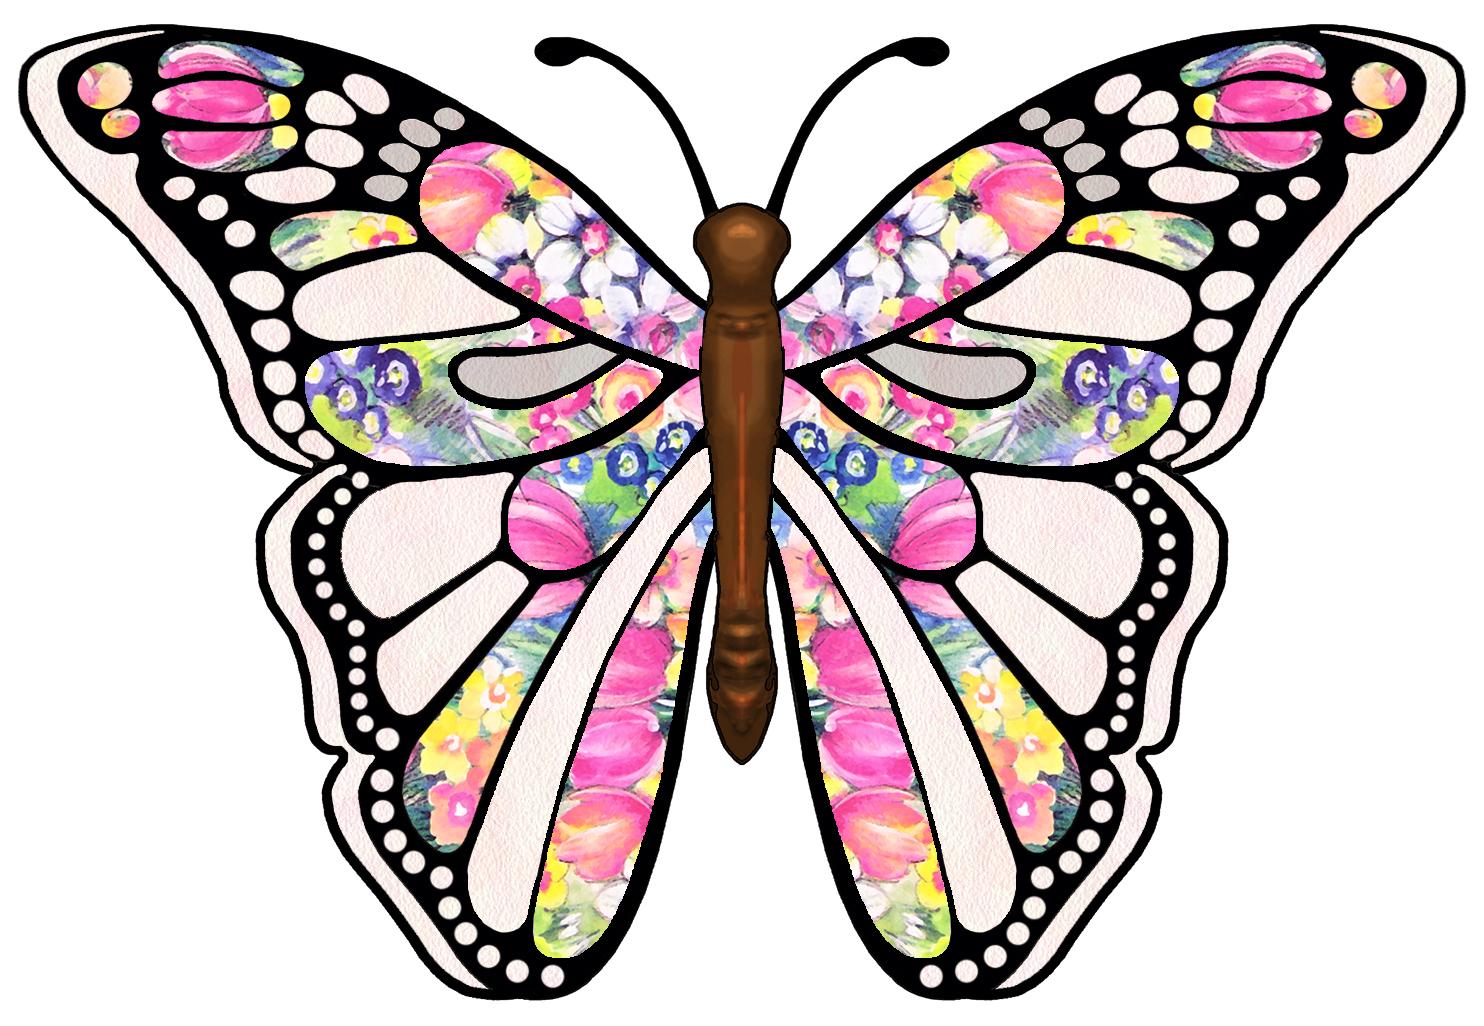 1484x1026 Butterfly Clip Art Butterfly Clipart Graphicsde 3